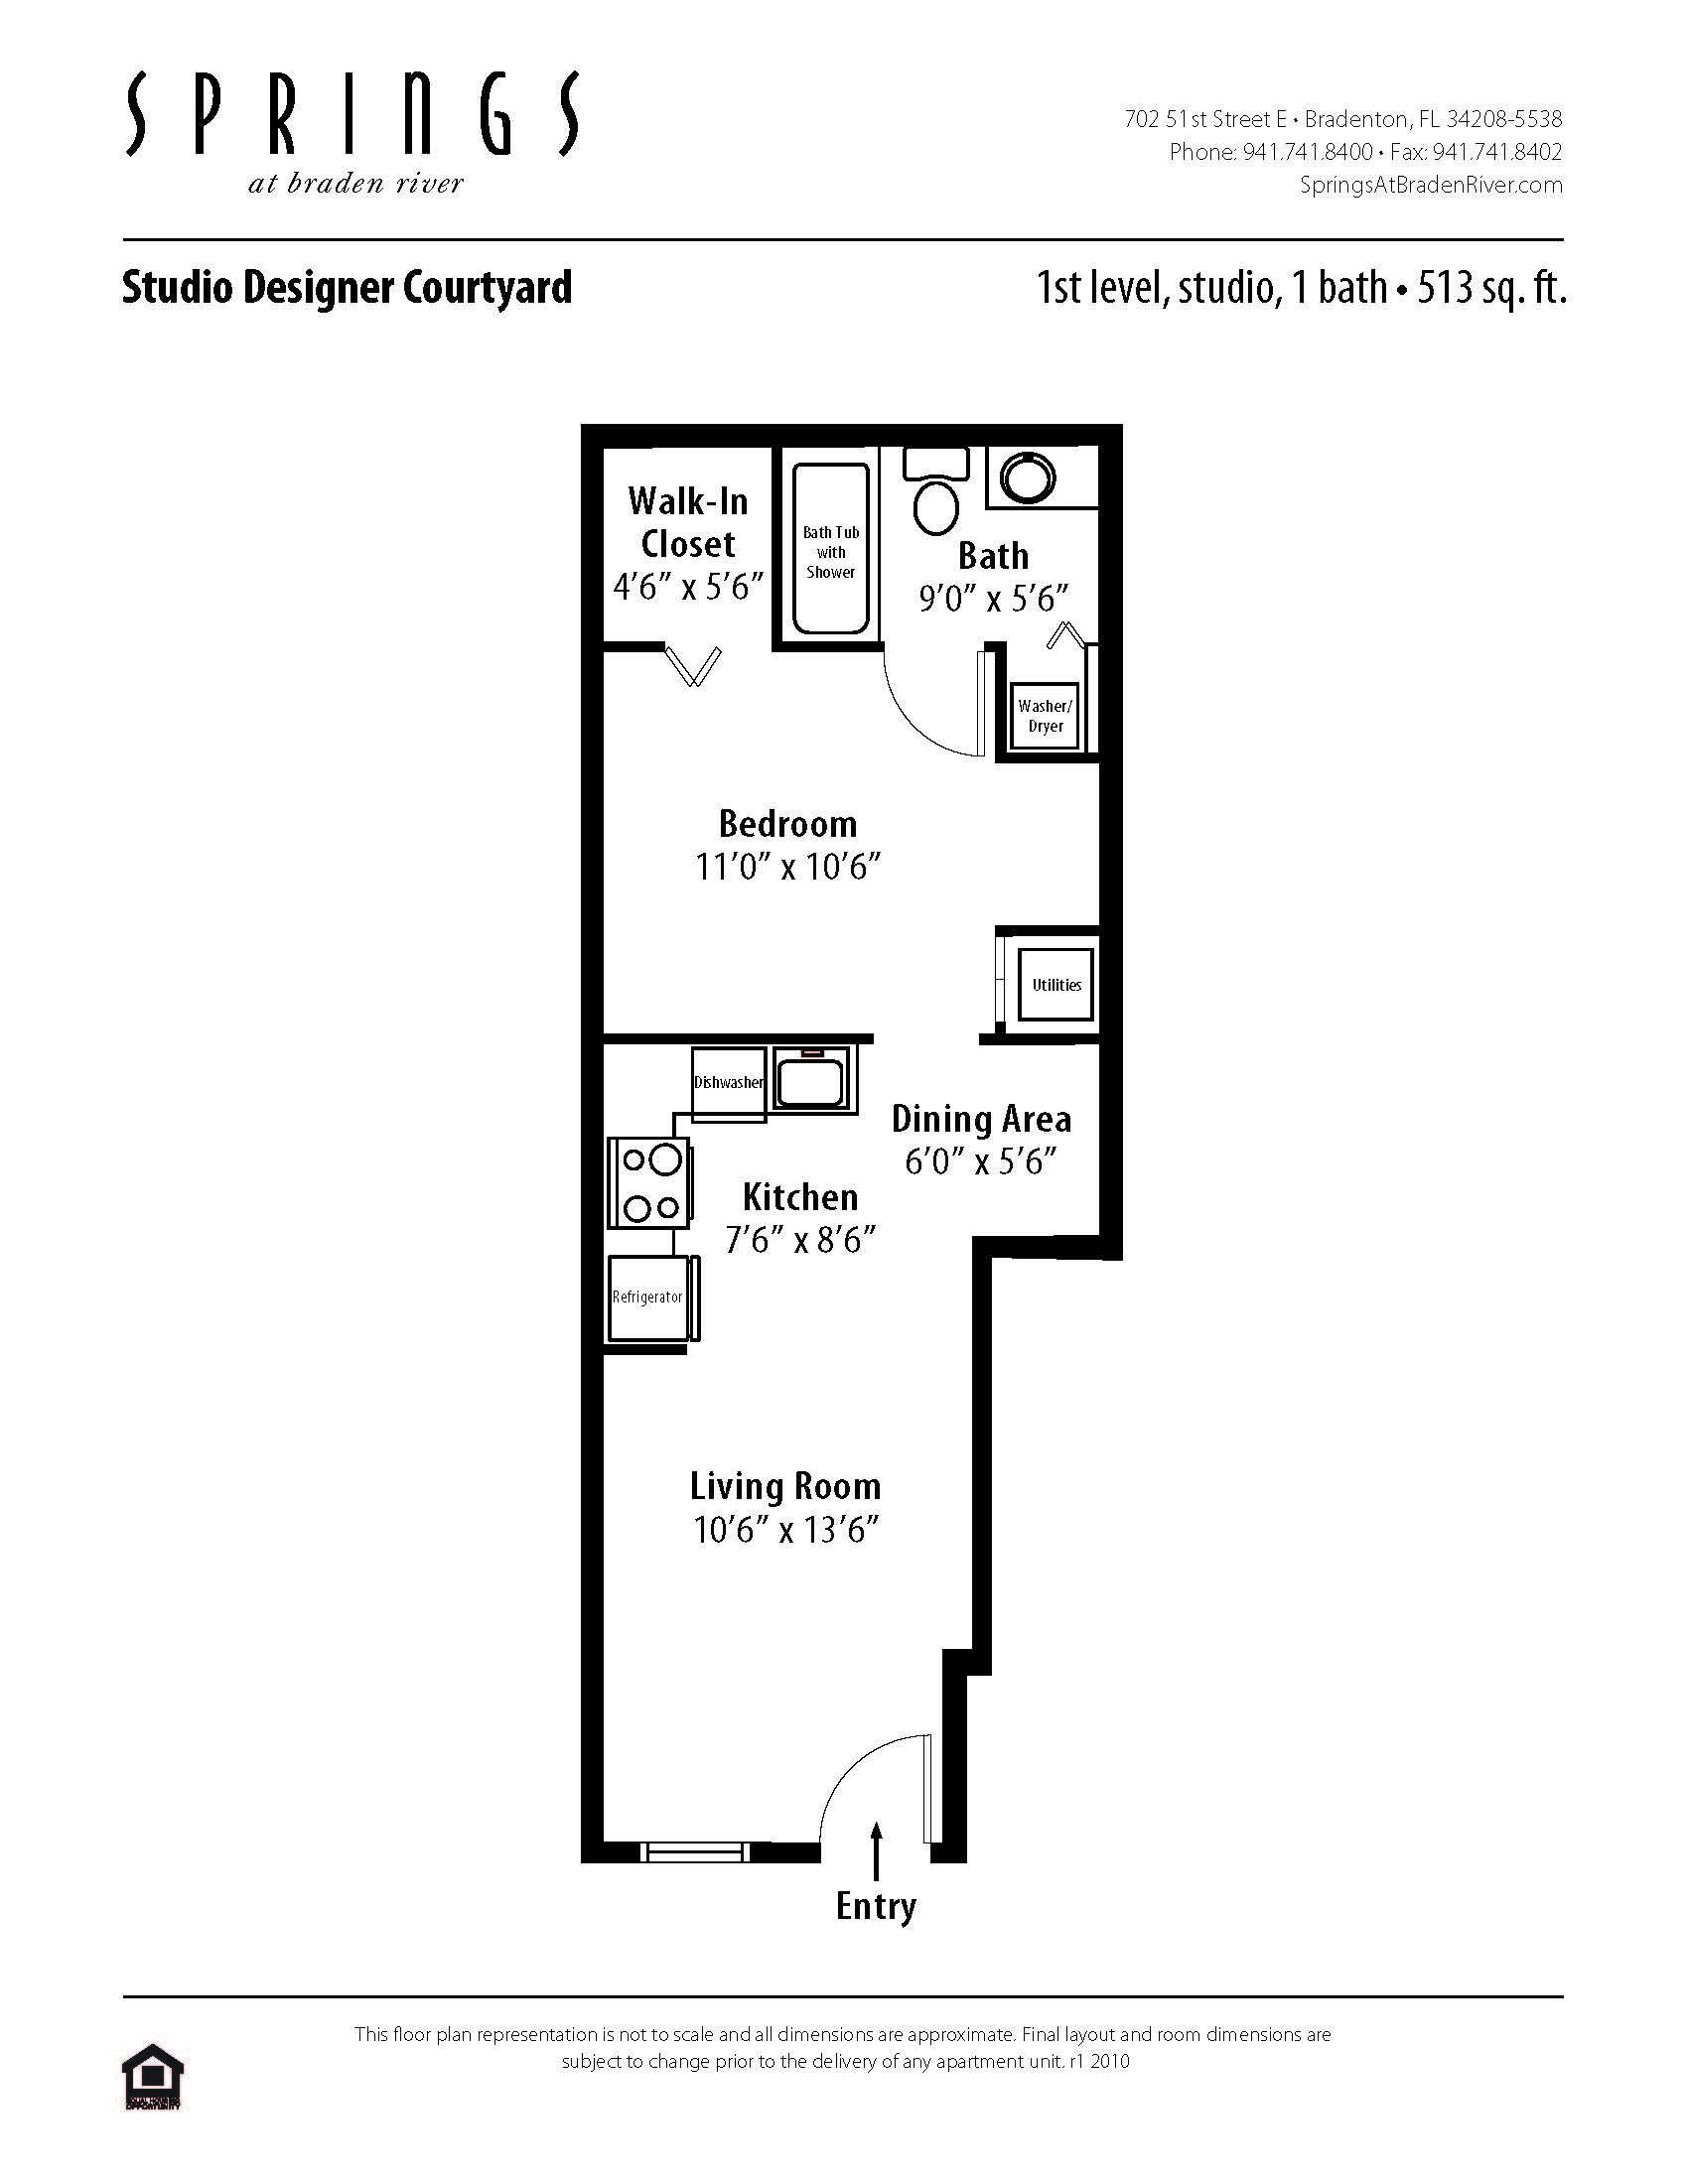 2 bedroom apartments in linden nj for  950 design ideas   4moltqa. 2 Bedroom Apartments In Linden Nj For  950 awesome ideas